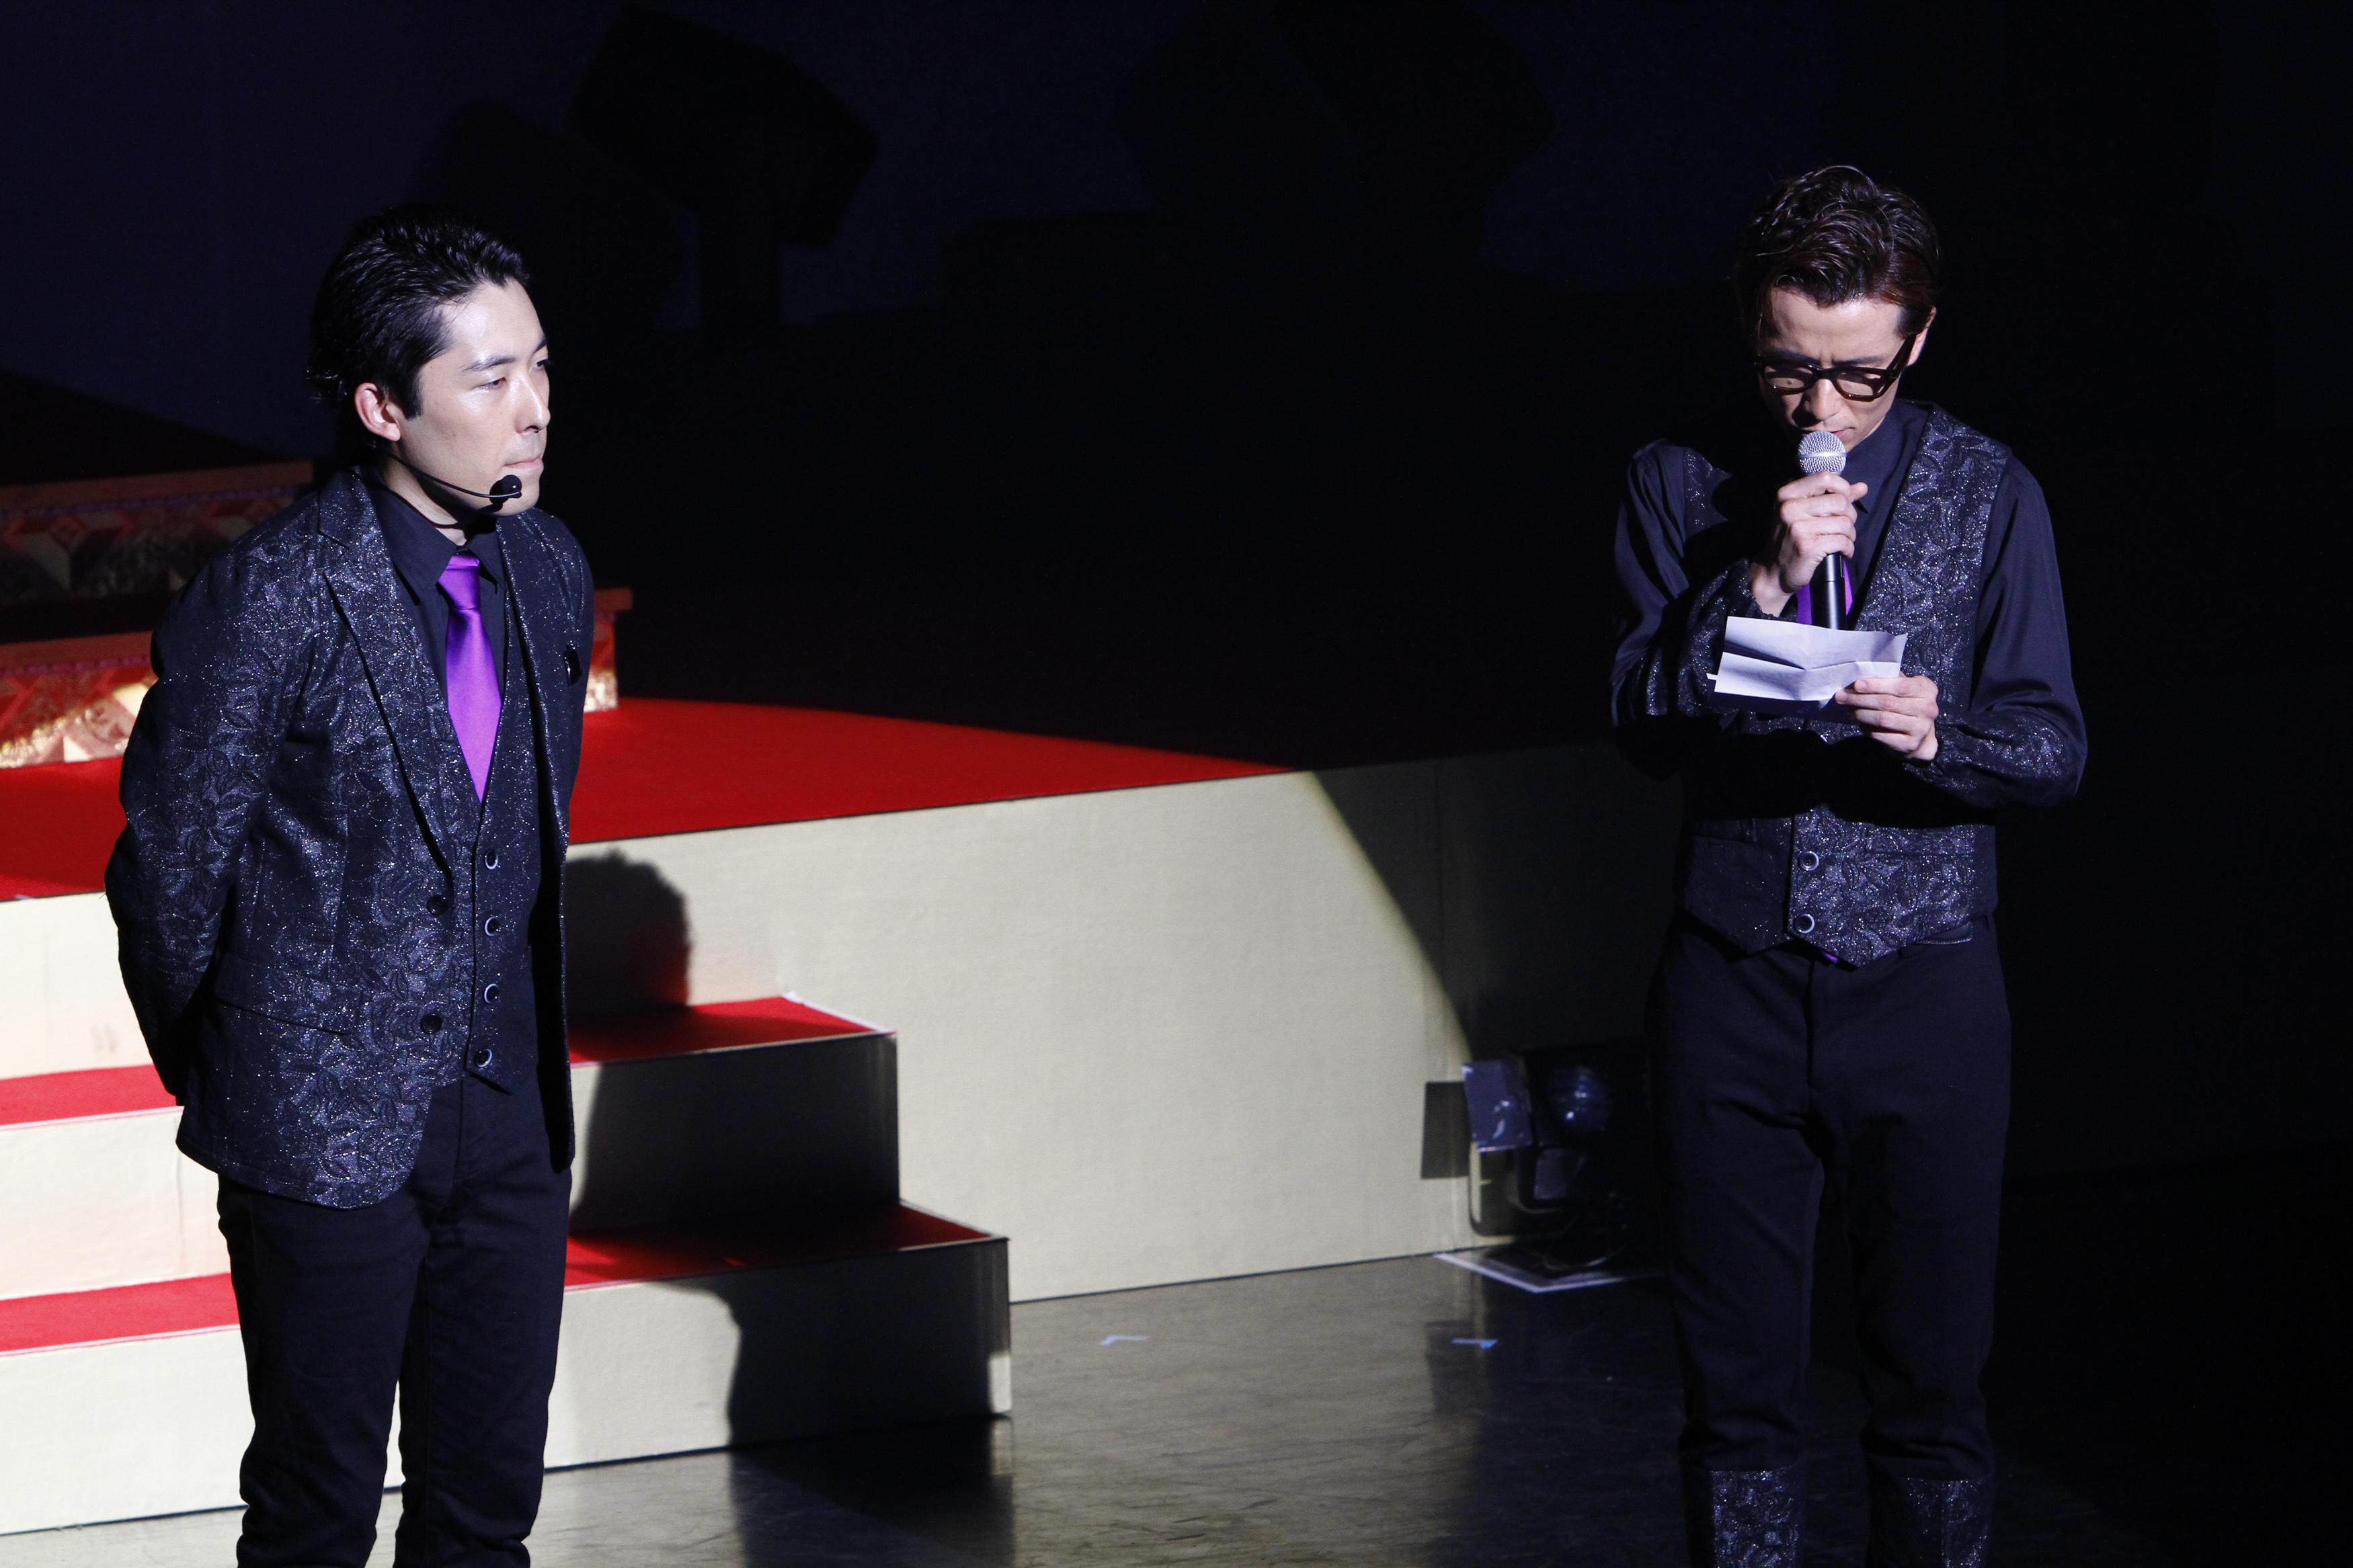 http://news.yoshimoto.co.jp/20160827114249-08e87cfcebf6afe165ee4a71d13d6638e8511982.jpg